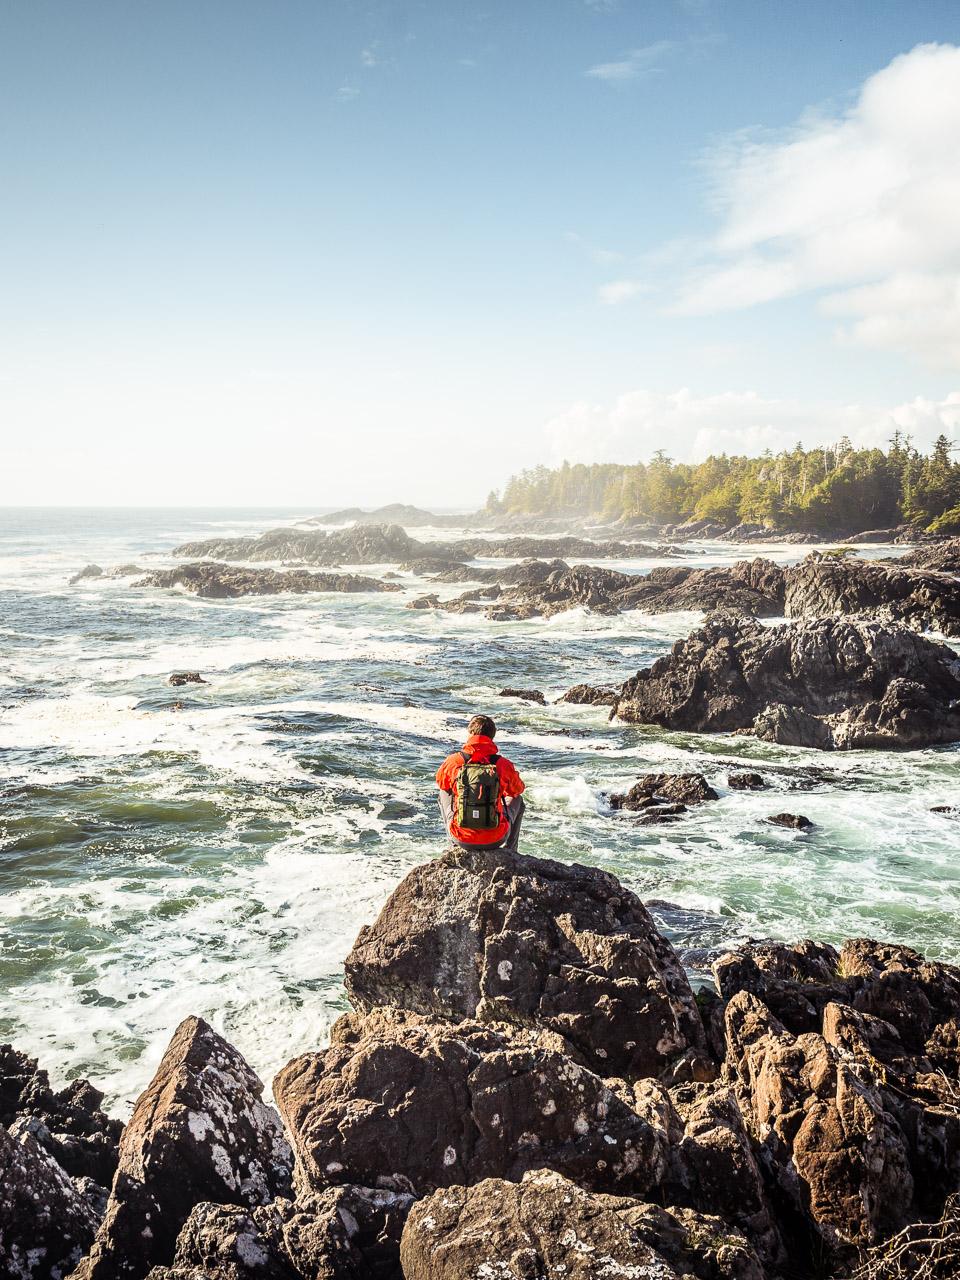 Northwest-America-Vancouver-Island-Canada-2016-_MG_8997